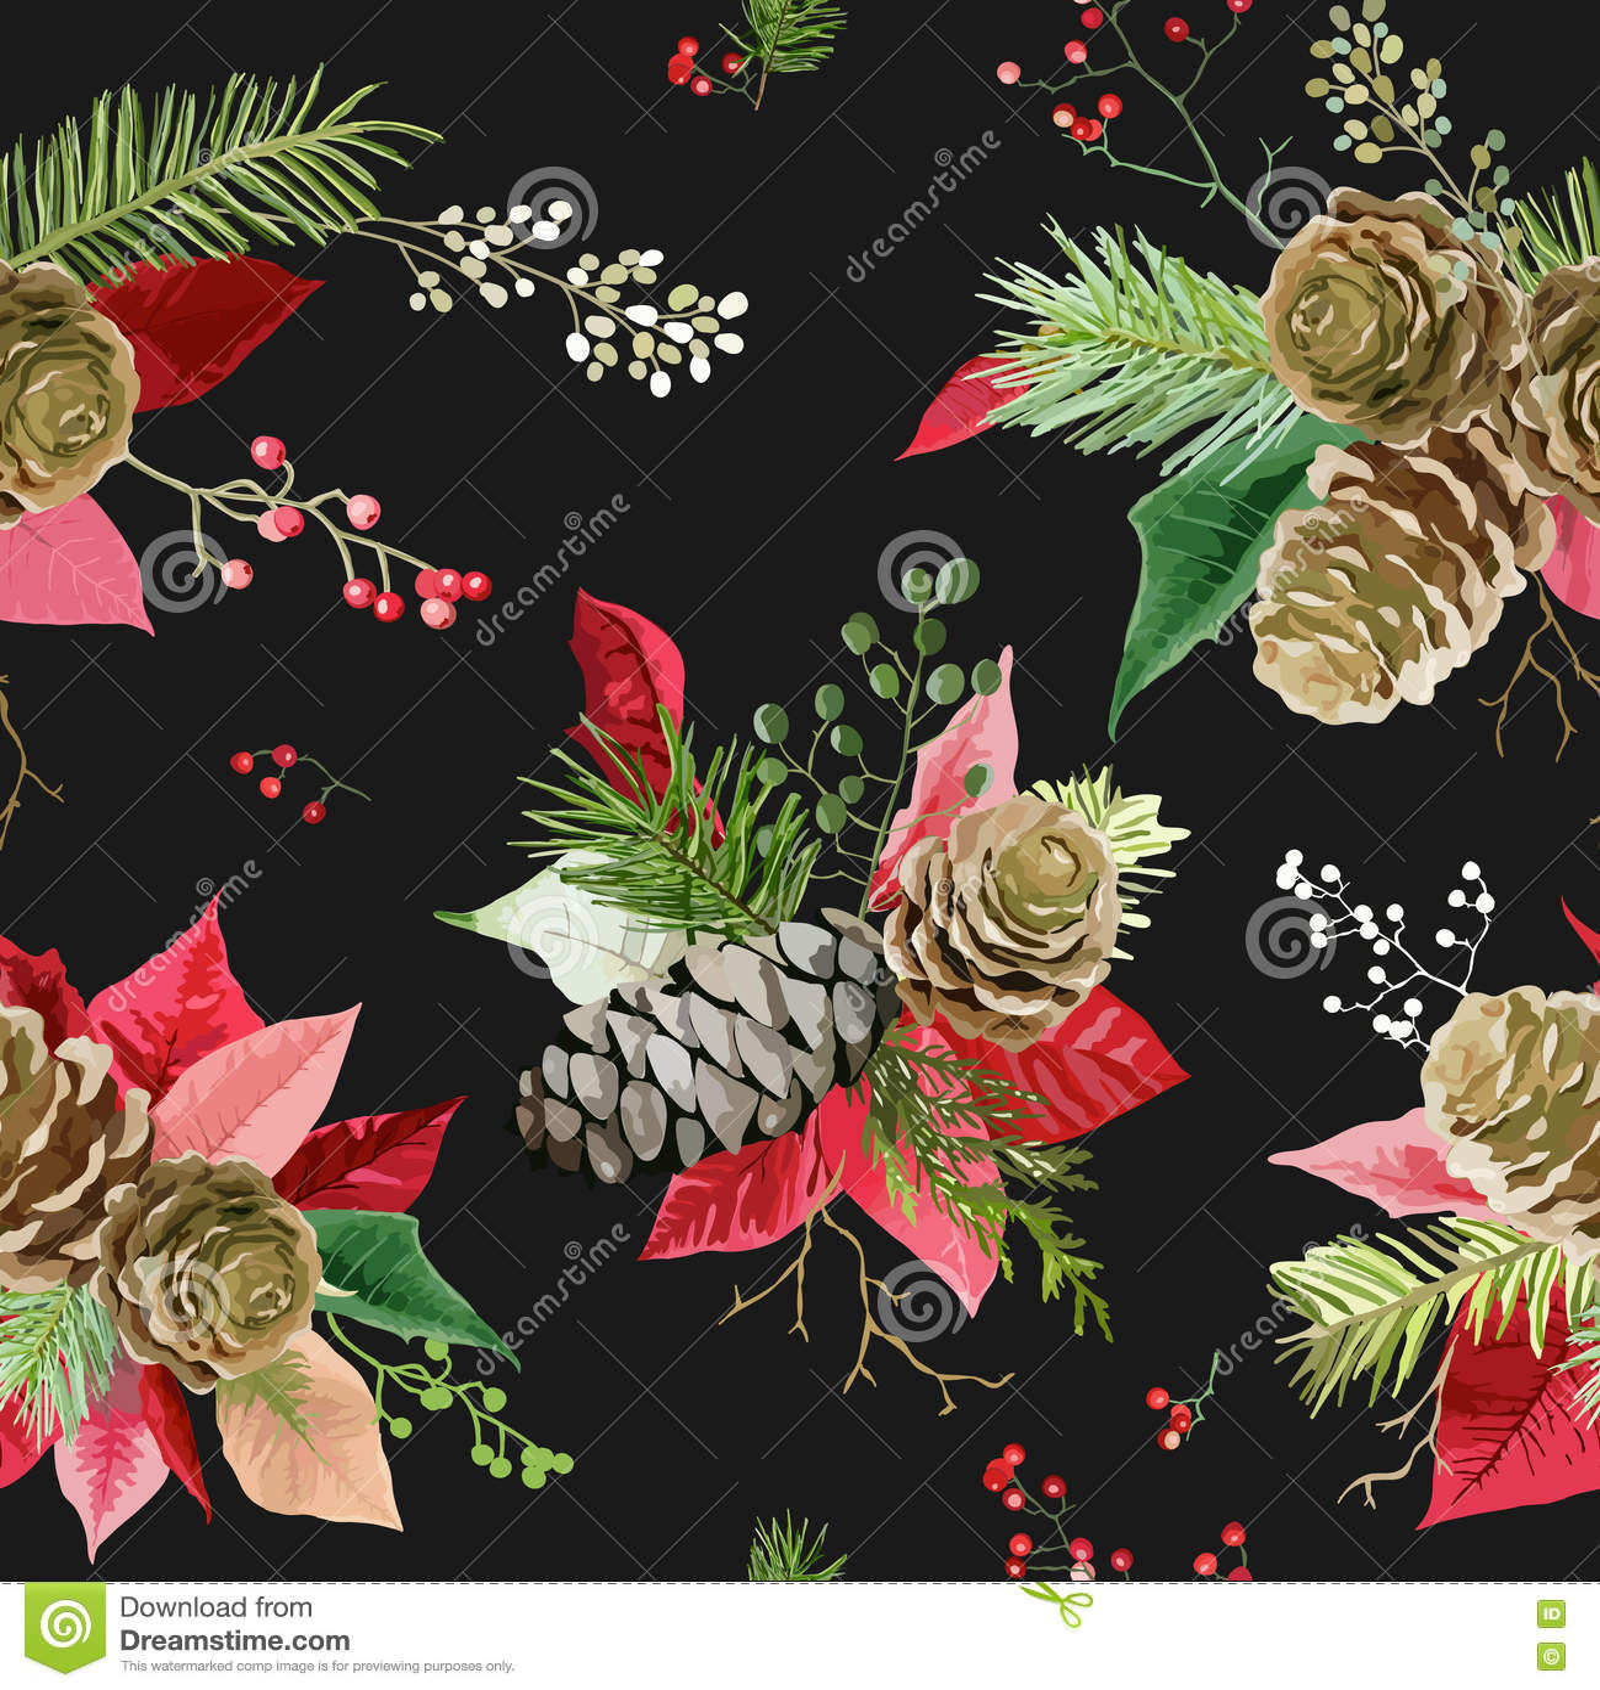 De uitstekende Poinsettia bloeien Achtergrond - Naadloos Kerstmispatroon